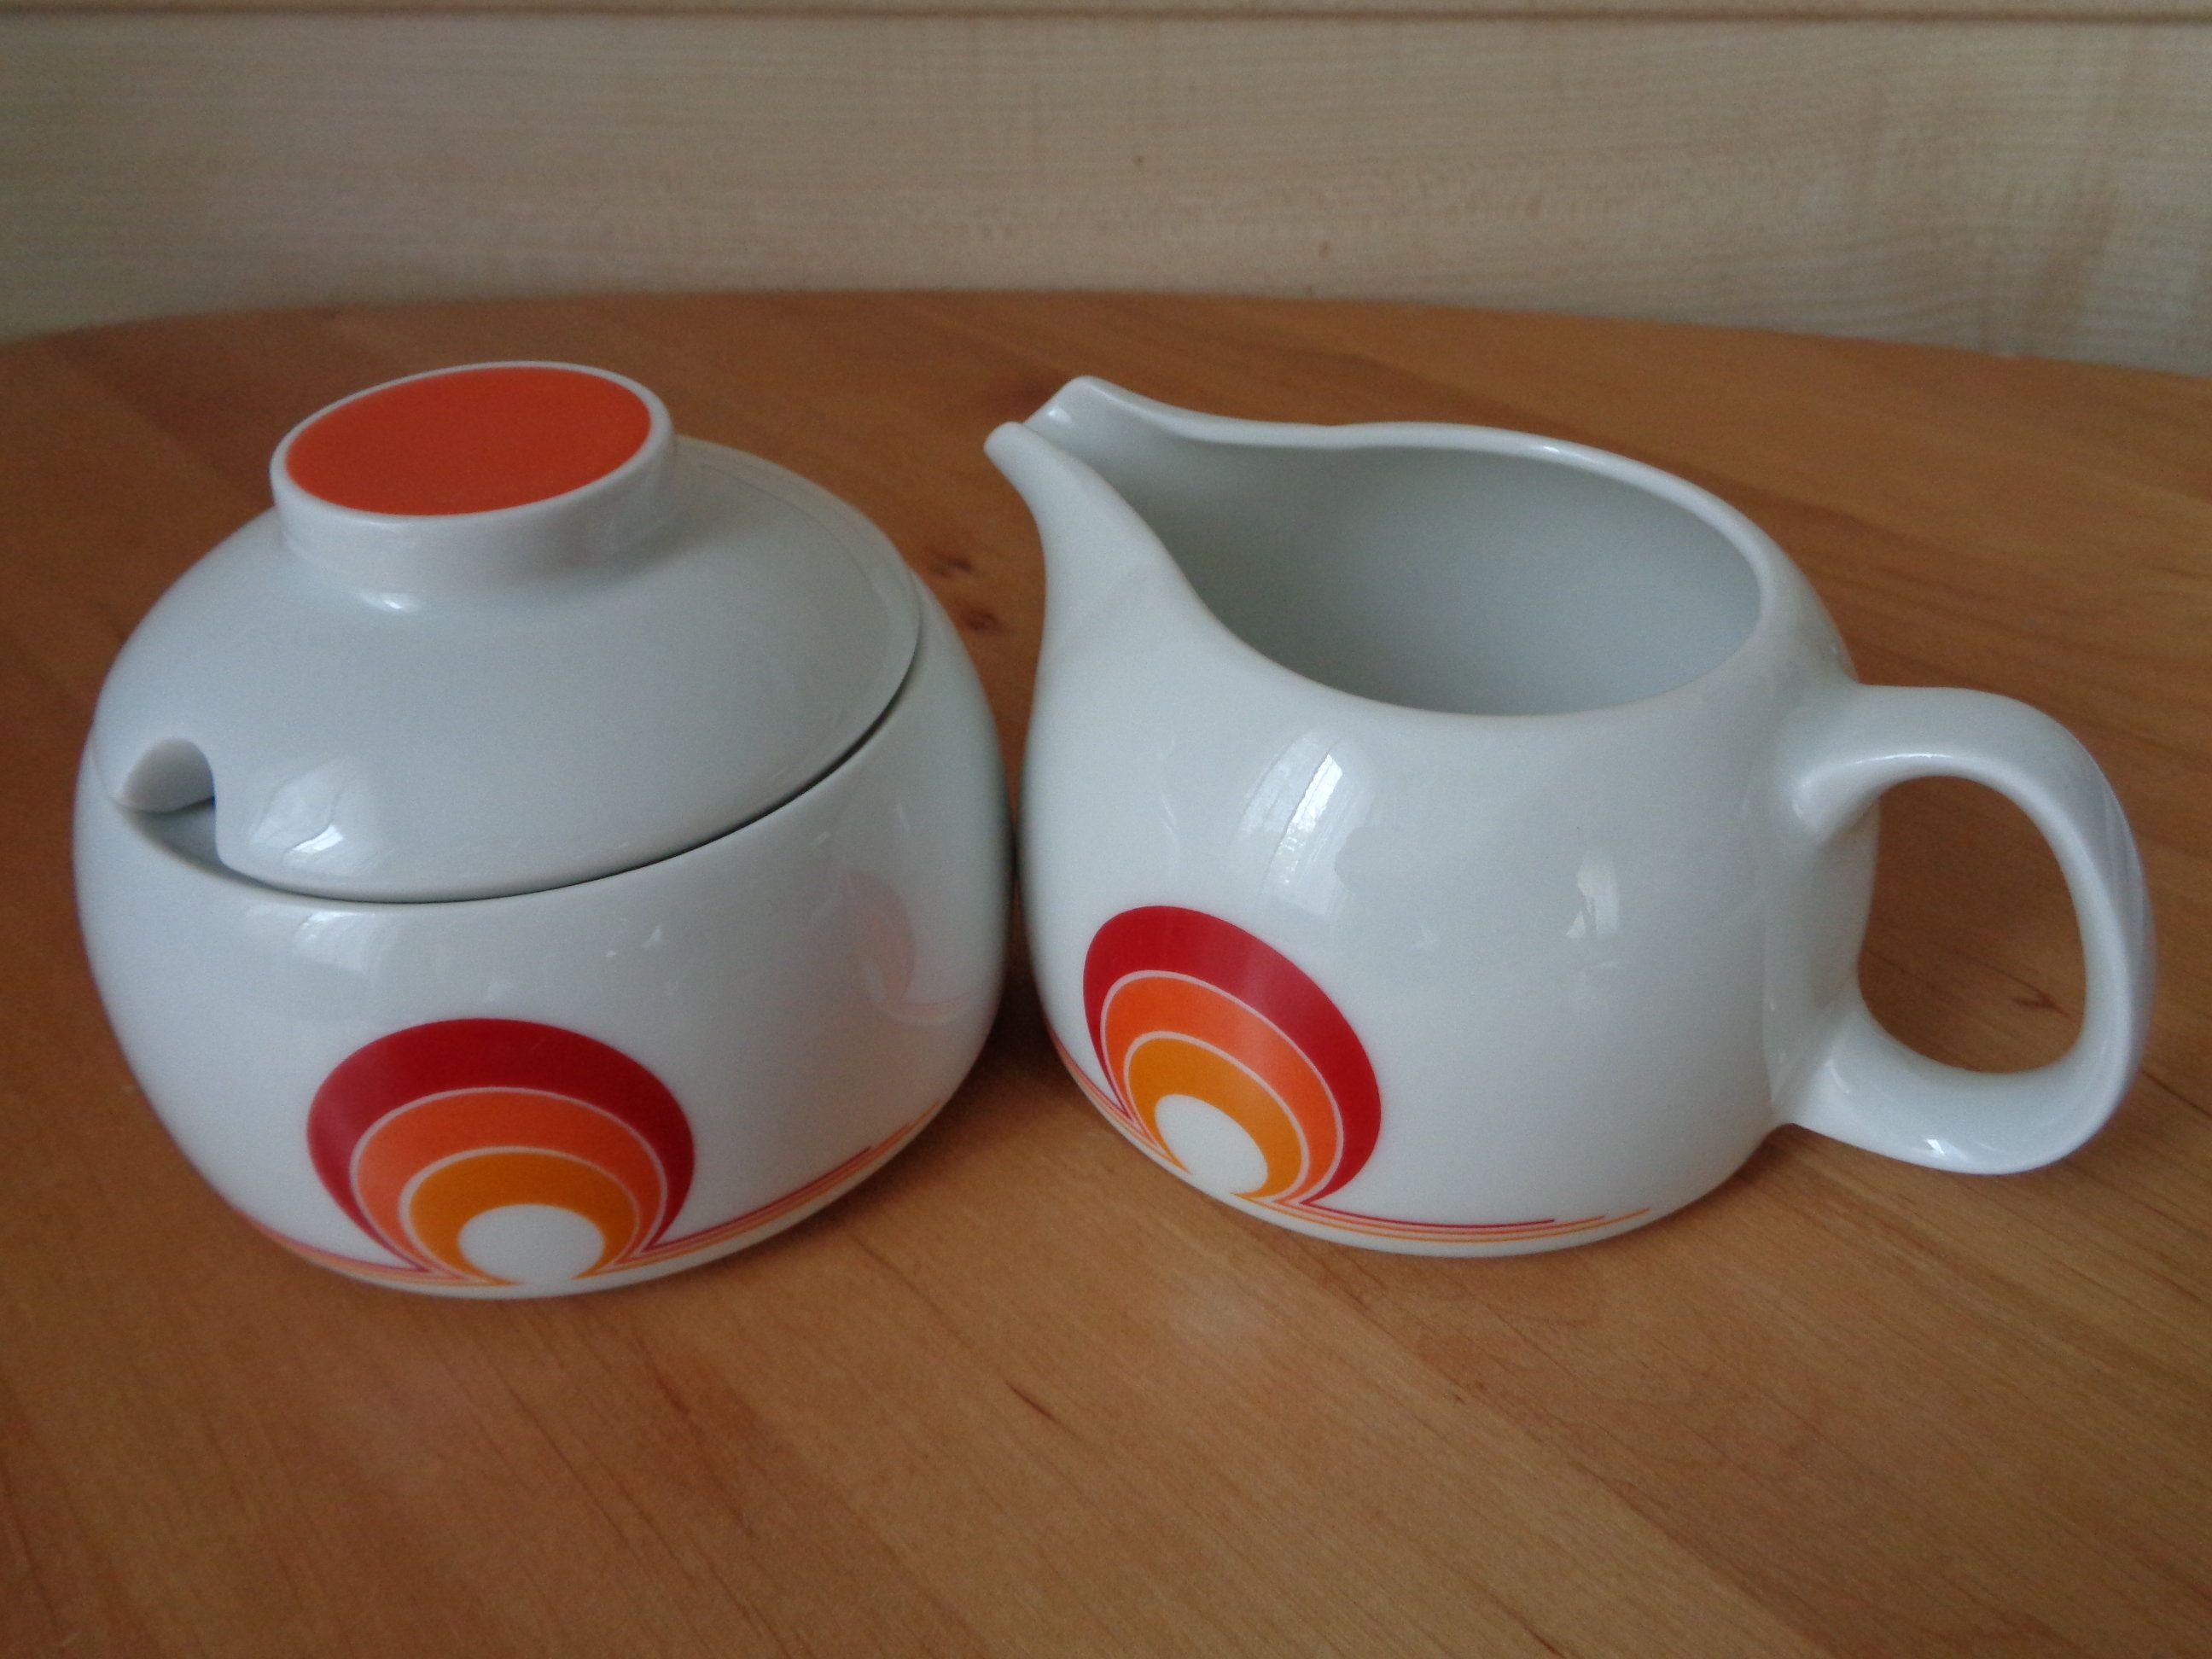 Schönwald Germany Porcelain Sugar Bowl & Creamer with